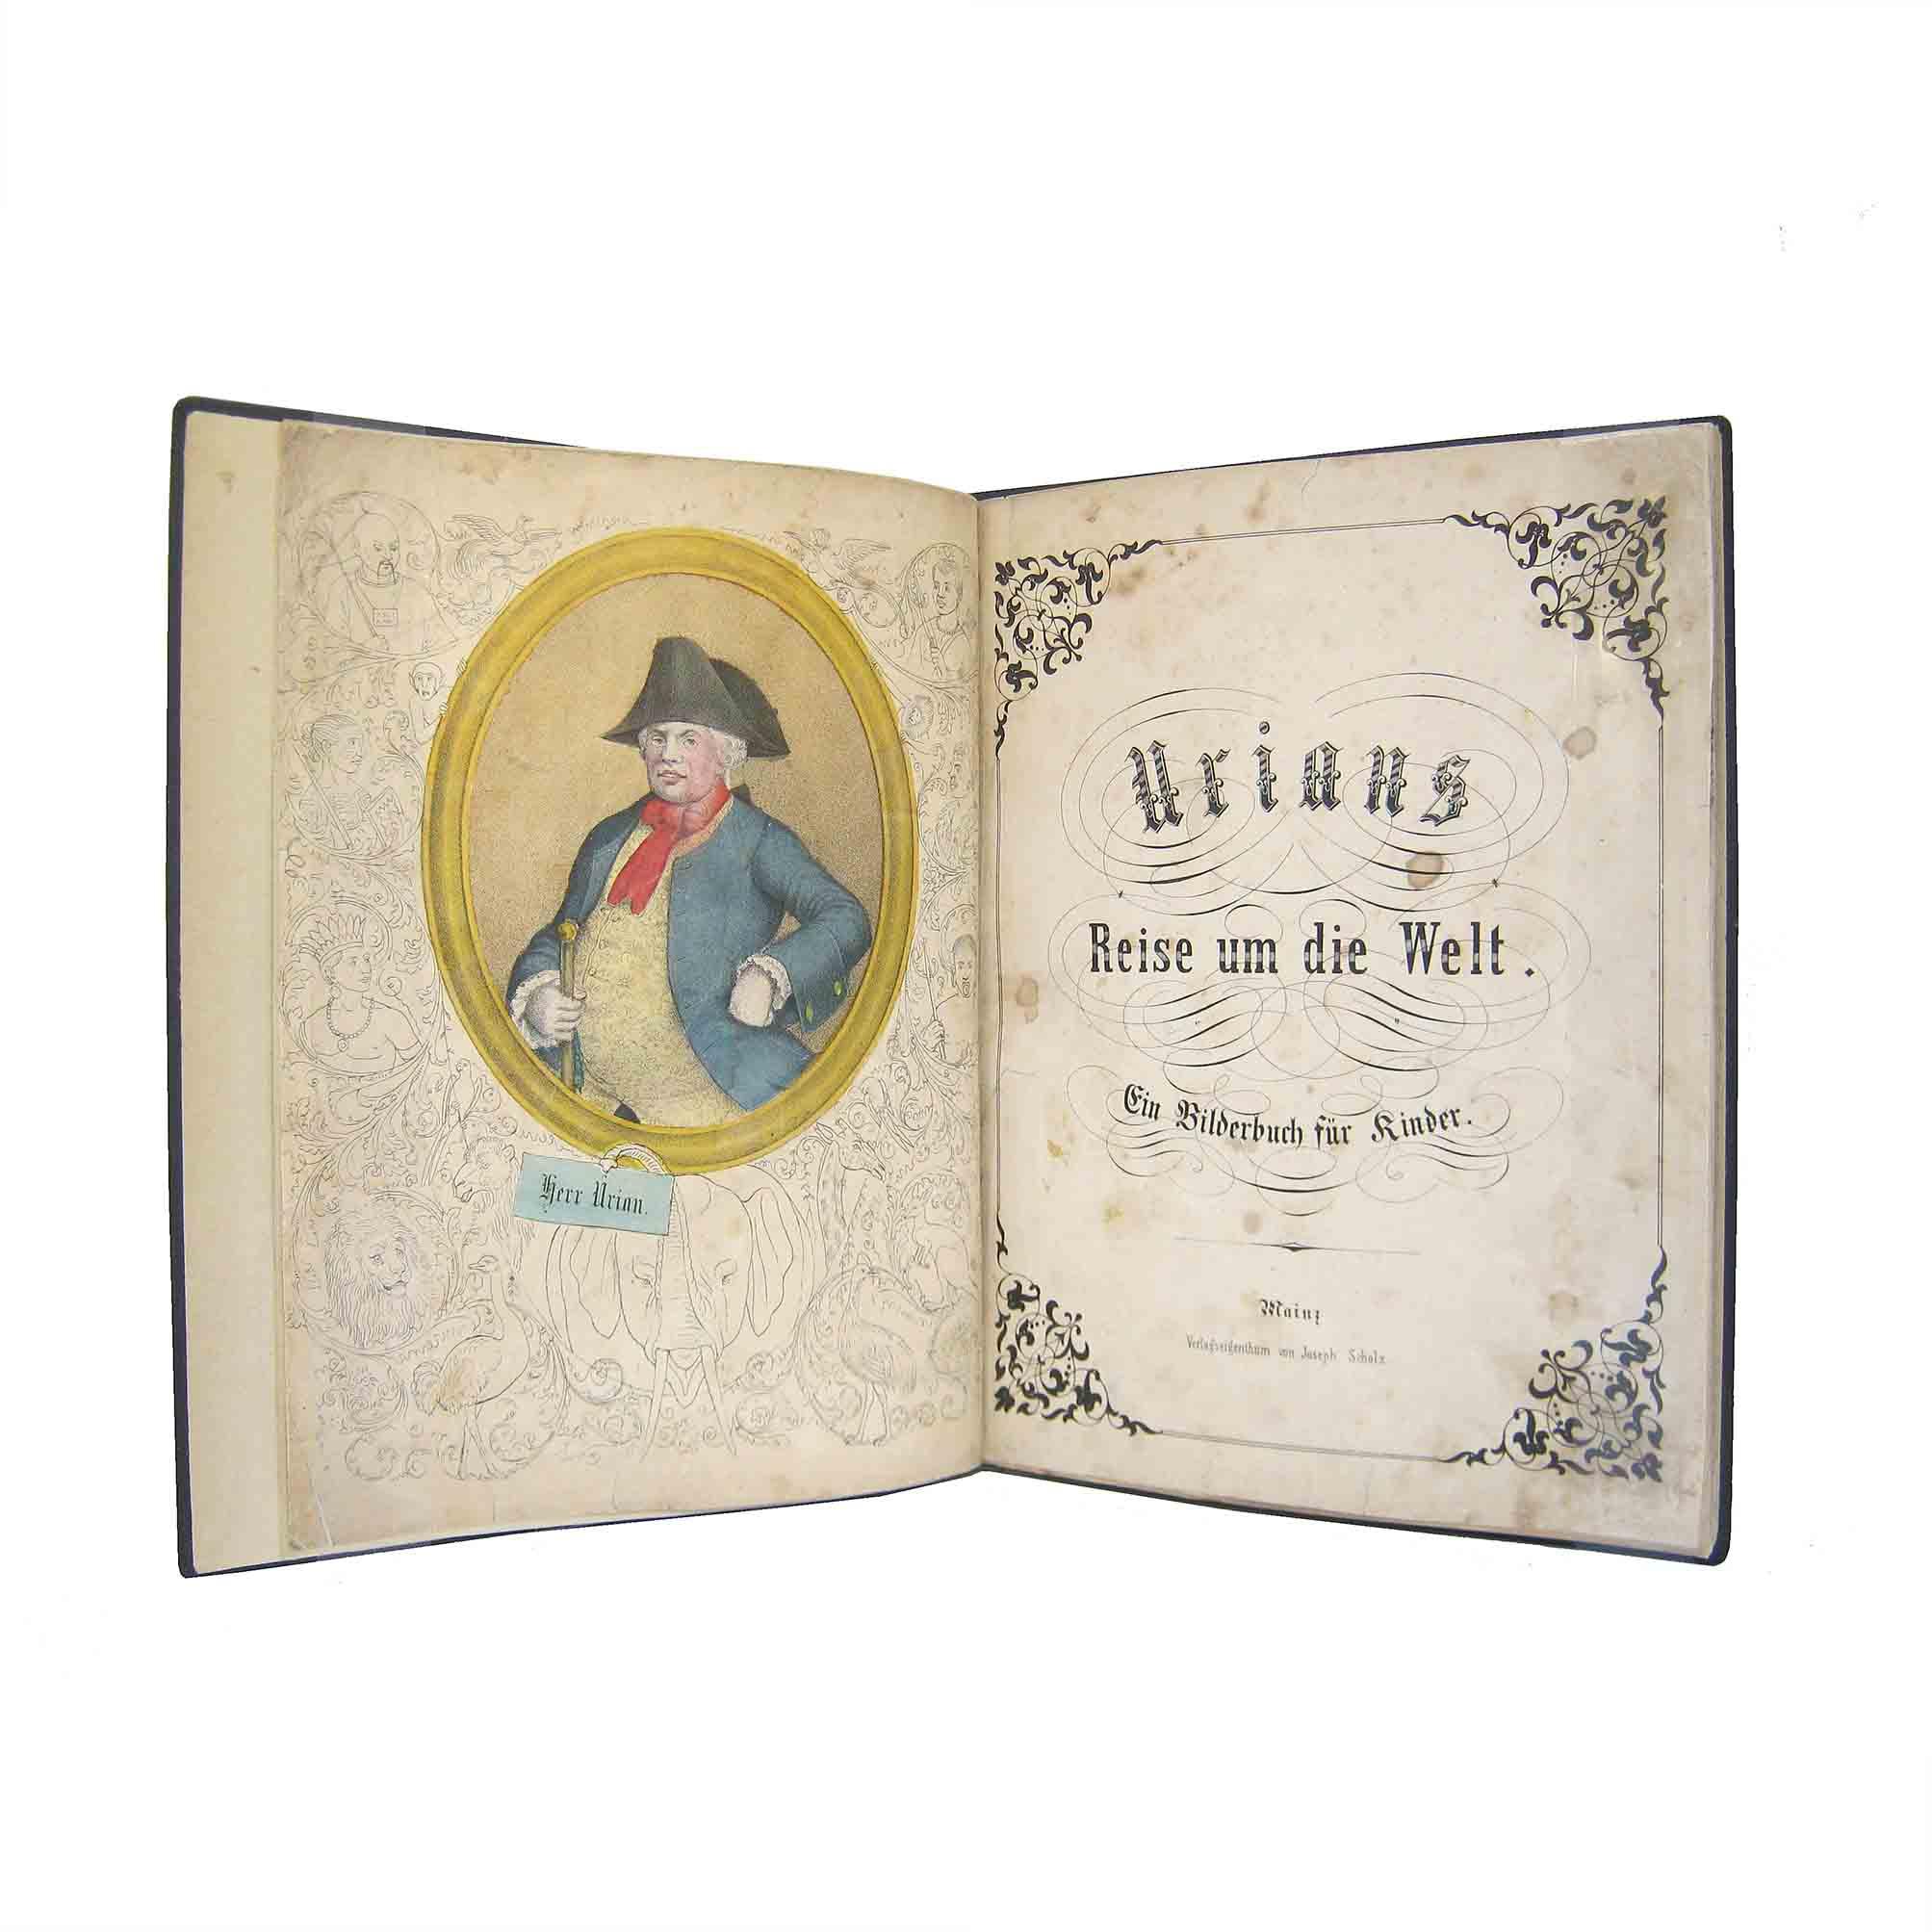 5495-Claudius-Urians-Reise-Scholz-um-1850-Titel-Front-frei-N.jpeg